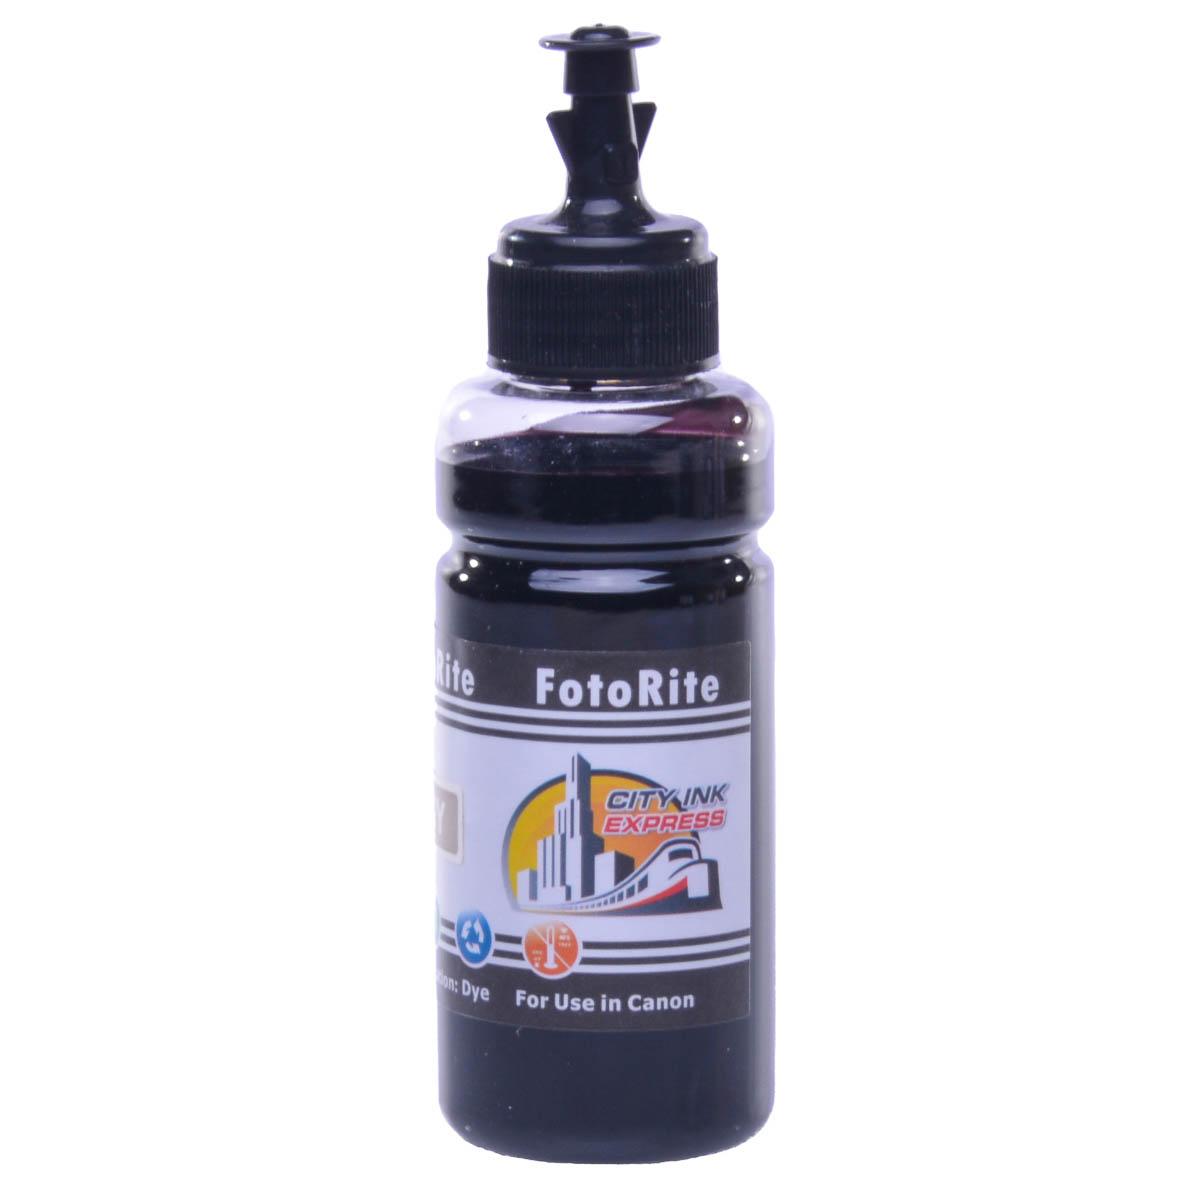 Cheap Grey dye ink replaces Canon Pixma TS8040 - CLI-571GY